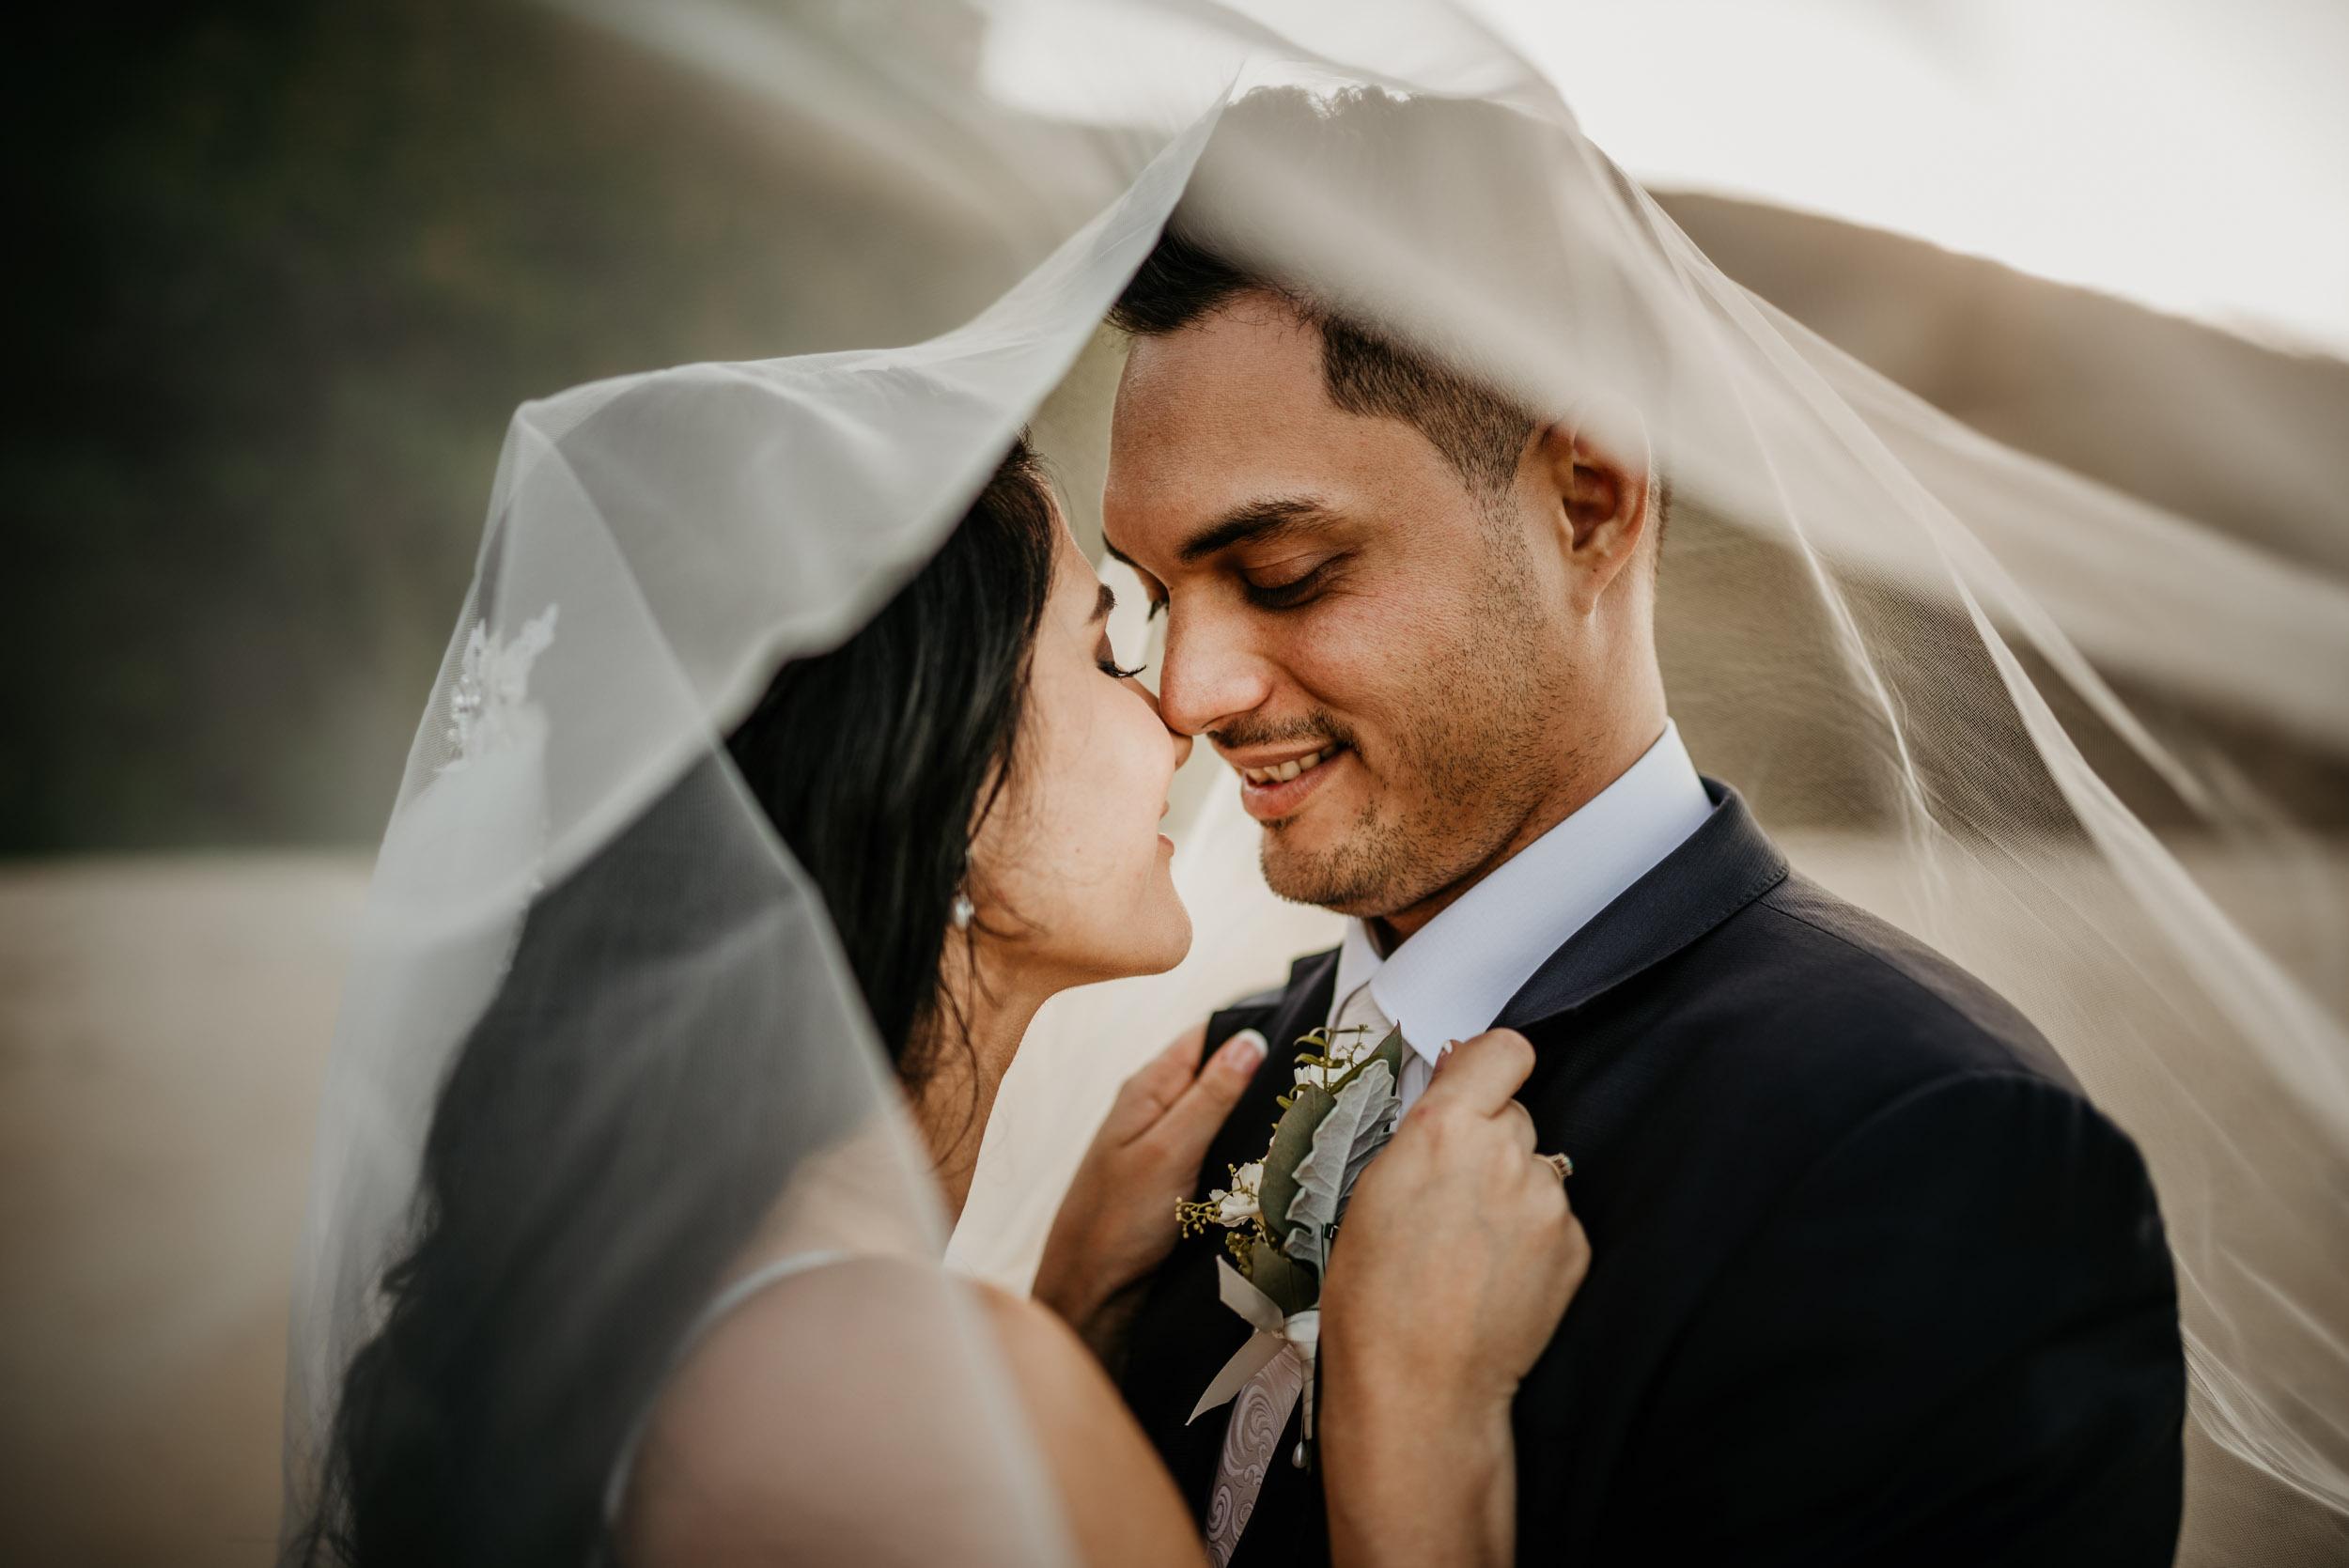 The Raw Photographer - Cairns Wedding Photographer - Beach Palm Cove Ceremony - Dress Irene Costa's Devine Bridal - Queensland-56.jpg